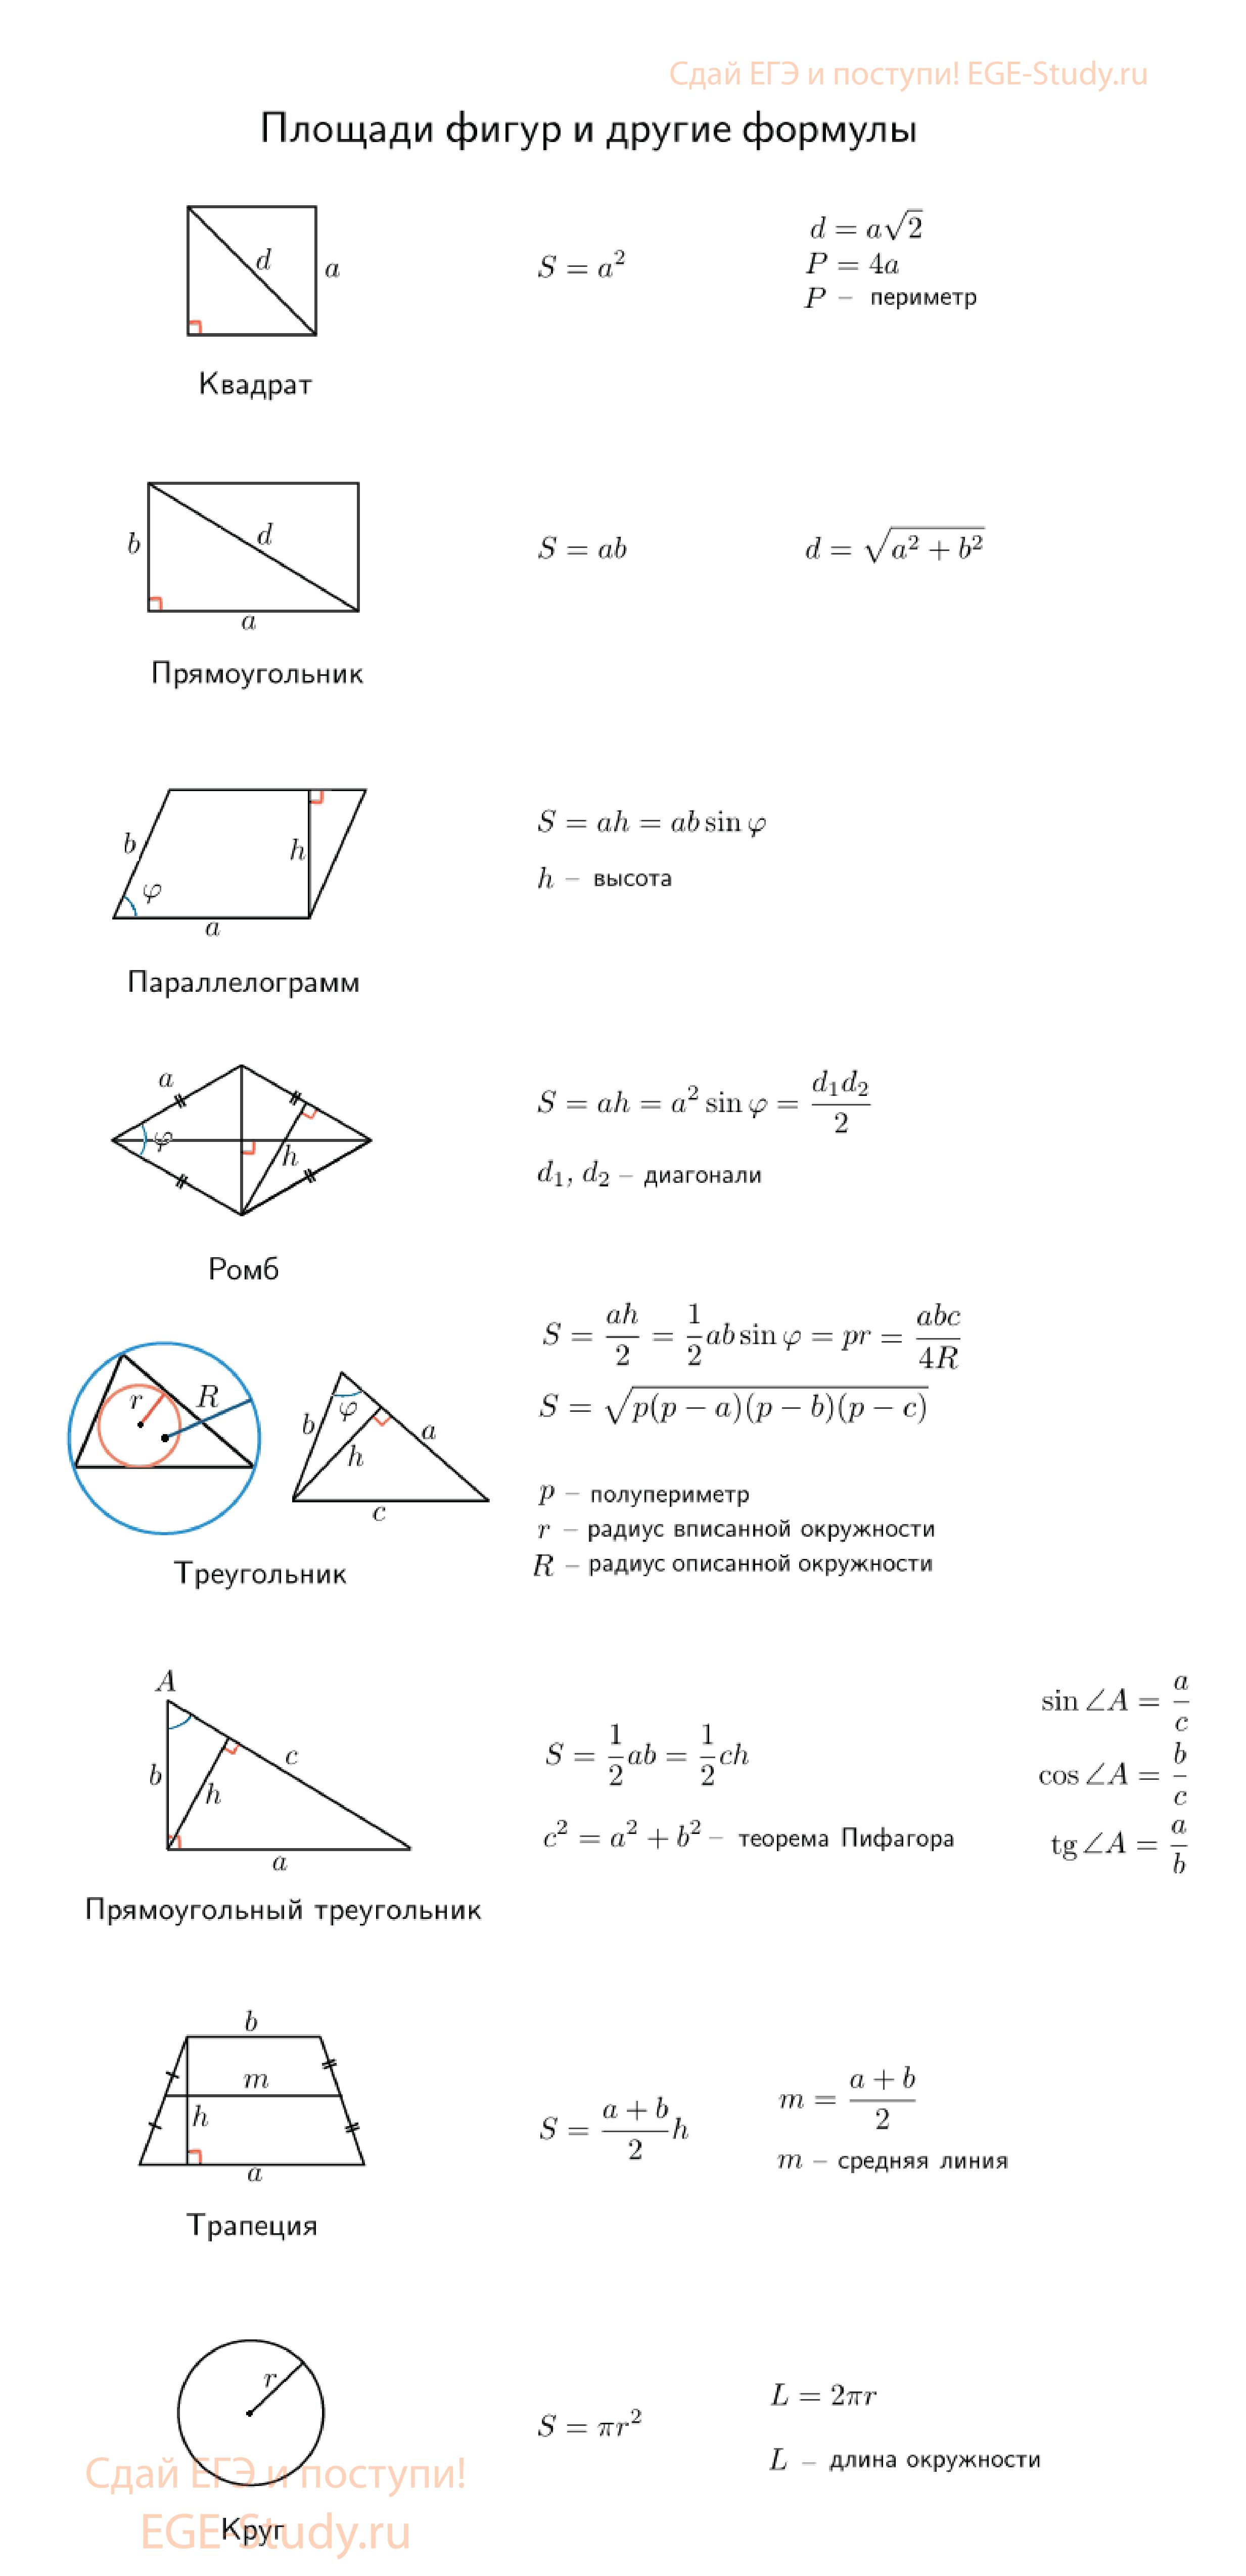 формулы по геометрии за 11 класс шпаргалка